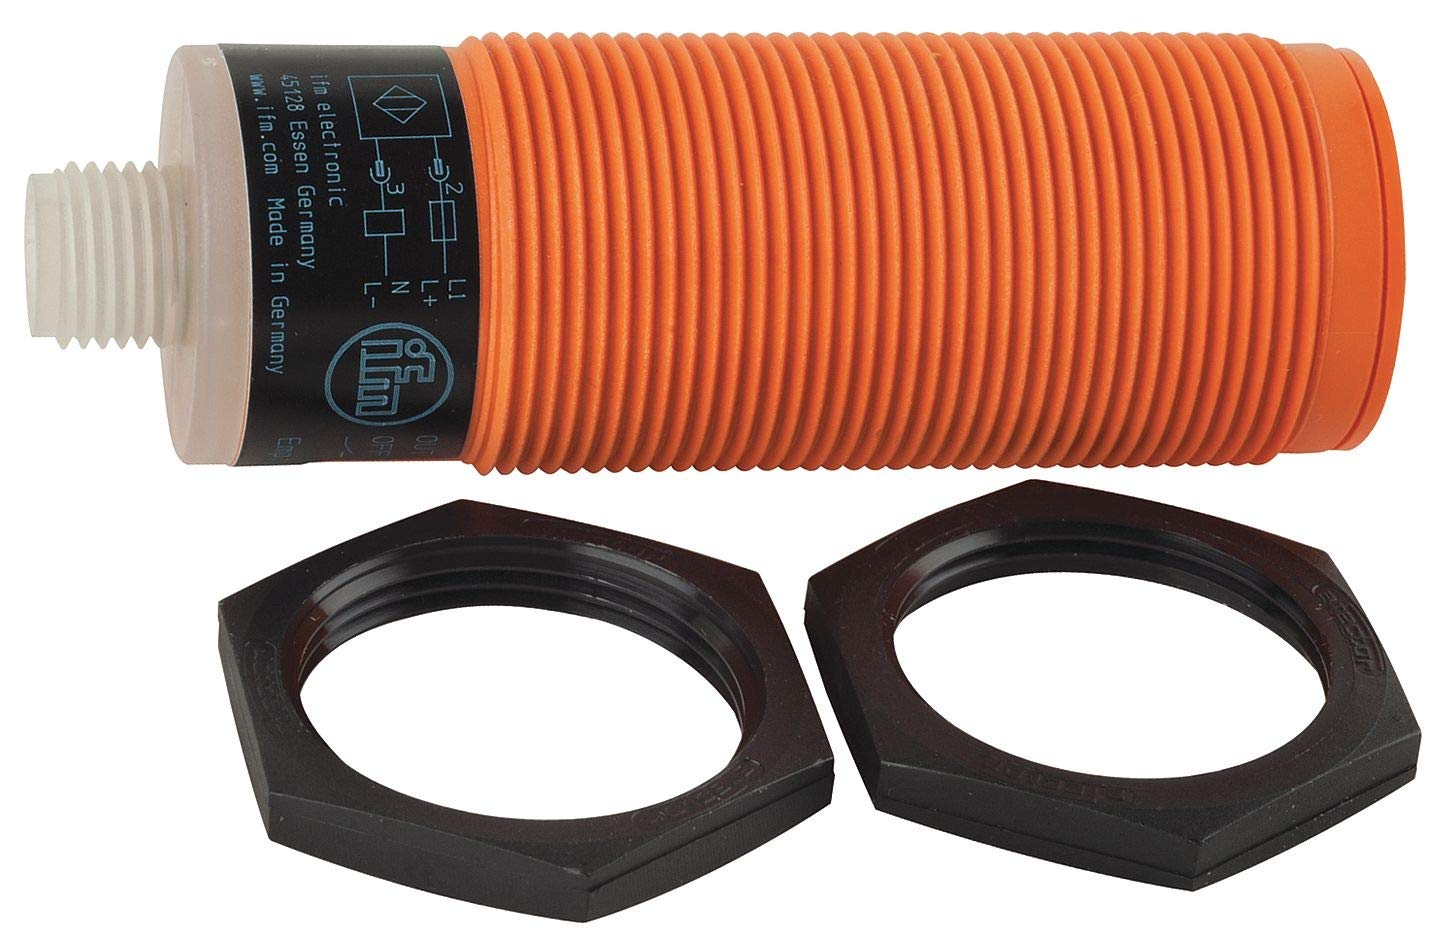 IFM Cylindrical Proximity Sensor, Plastic Basic Material, 2 Wire Circuit Type, NO/NC Output Mode - KI0054